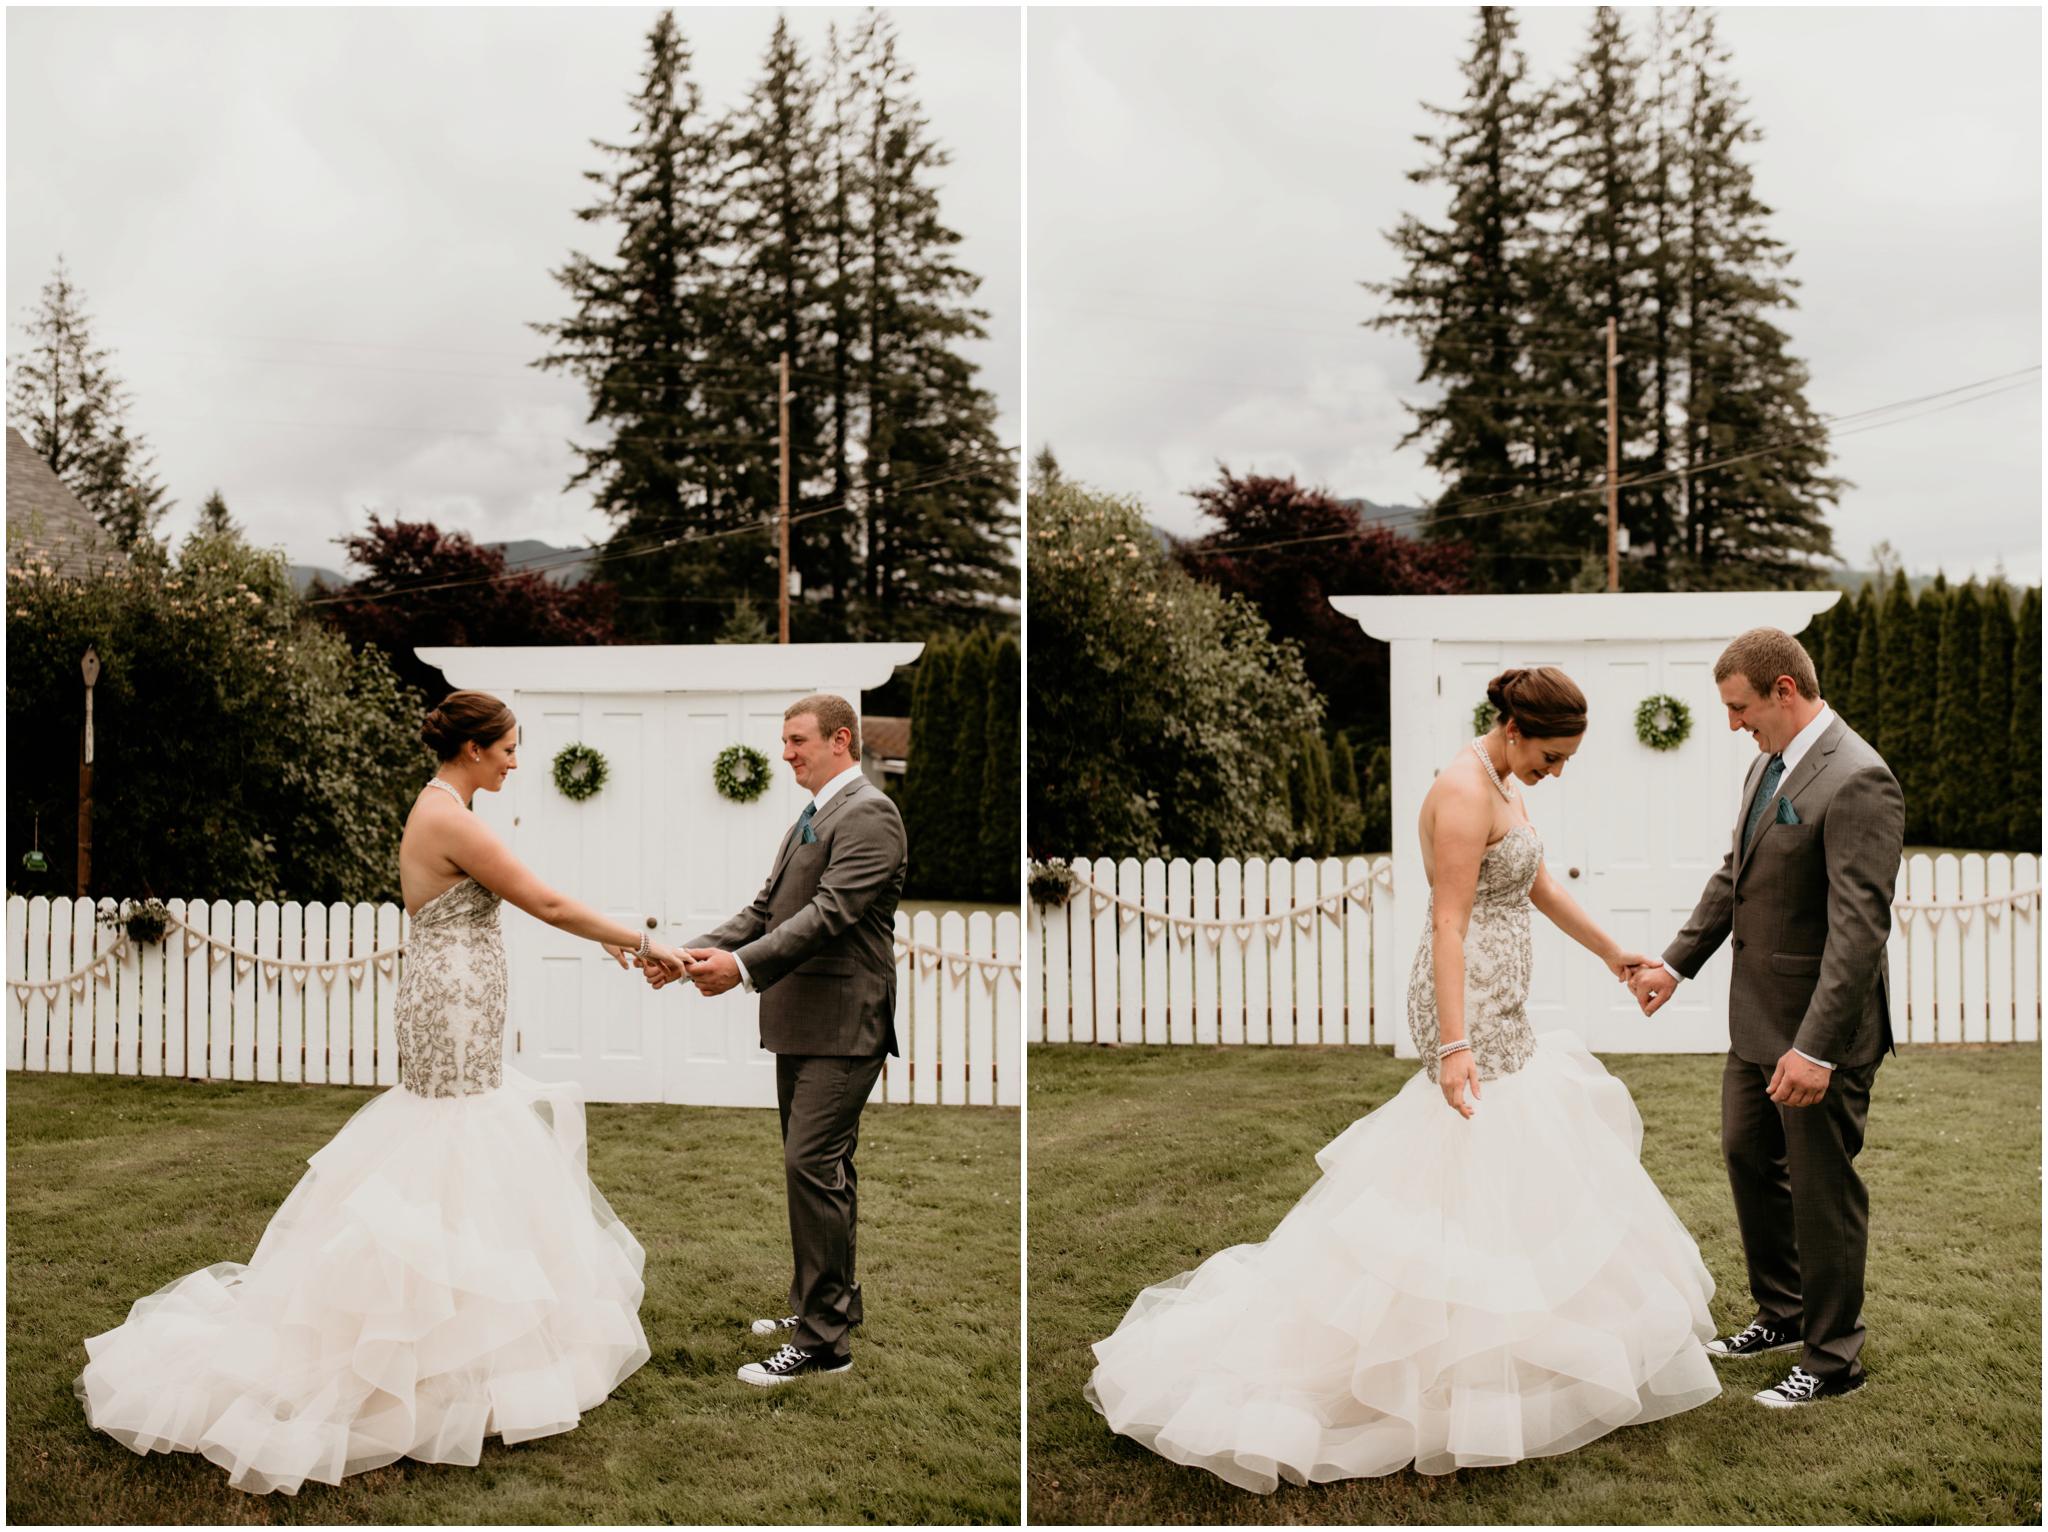 alex-and-matthew-three-cs-farm-venue-seattle-wedding-photographer-039.jpg